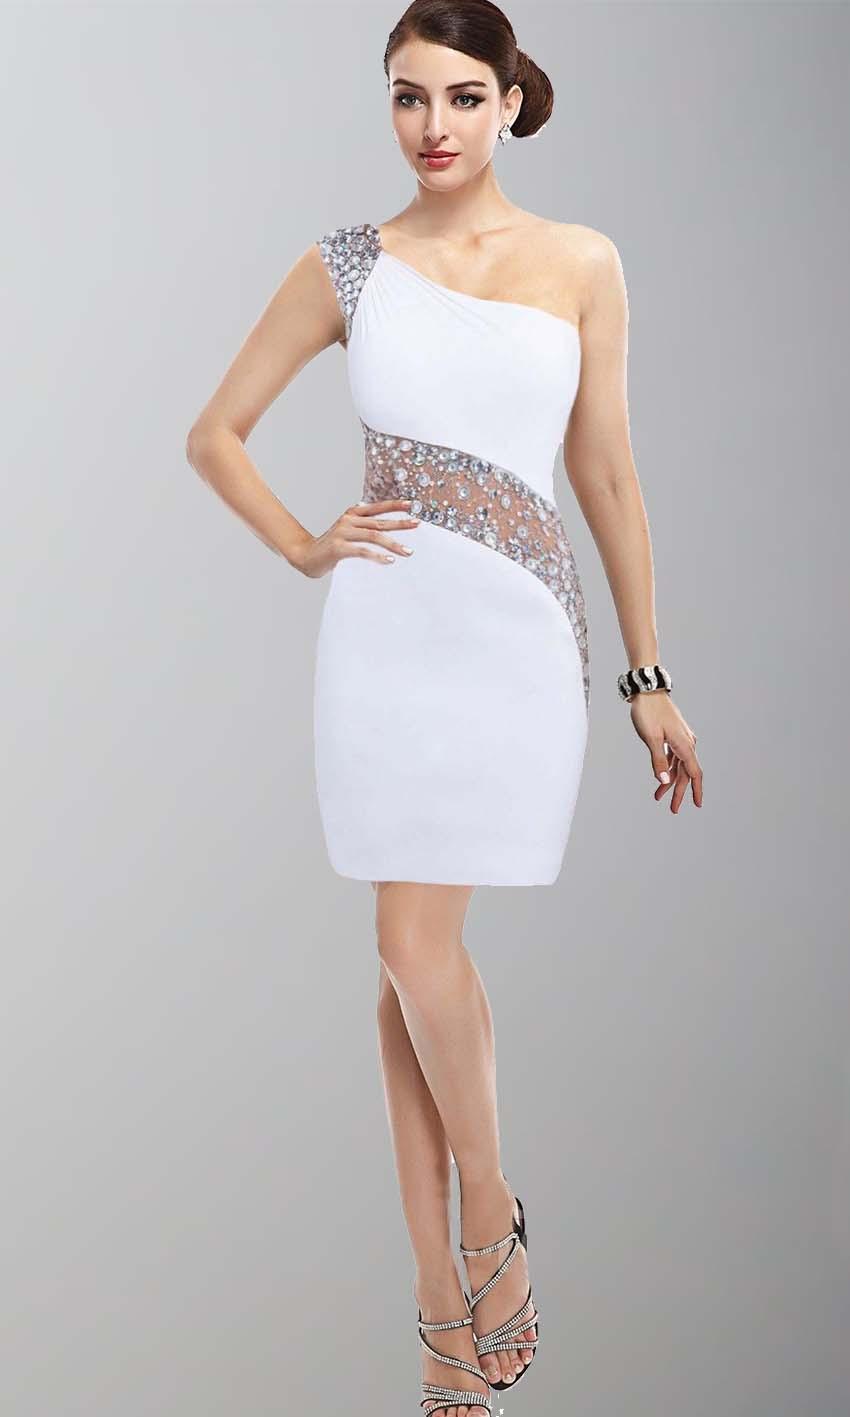 Cute Sequin One Shoulder Bodycon Short White Grade Dress KSP396 ...